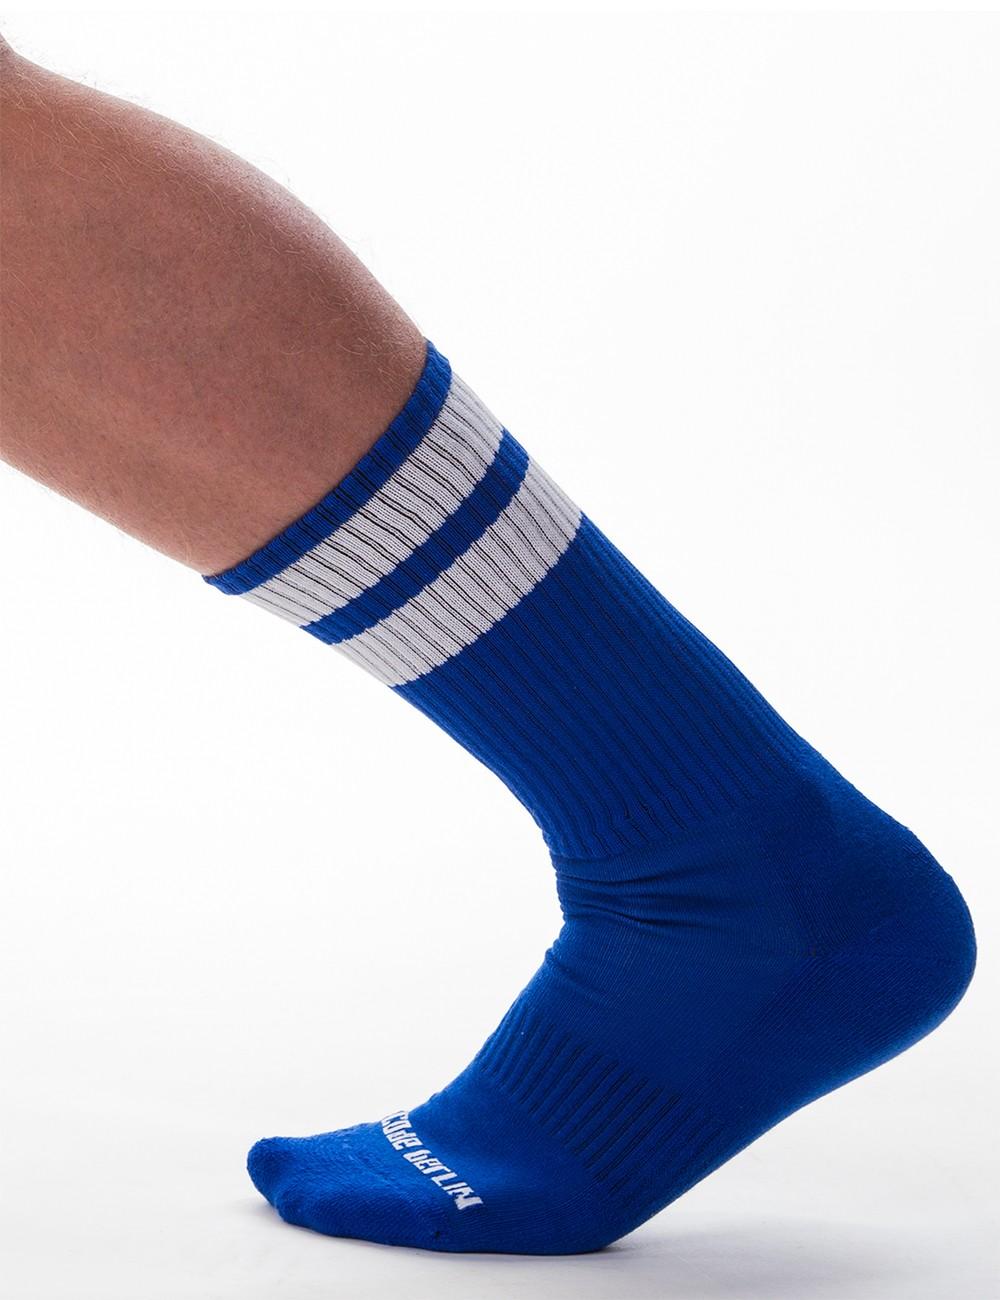 Gym Socks - Royal-White